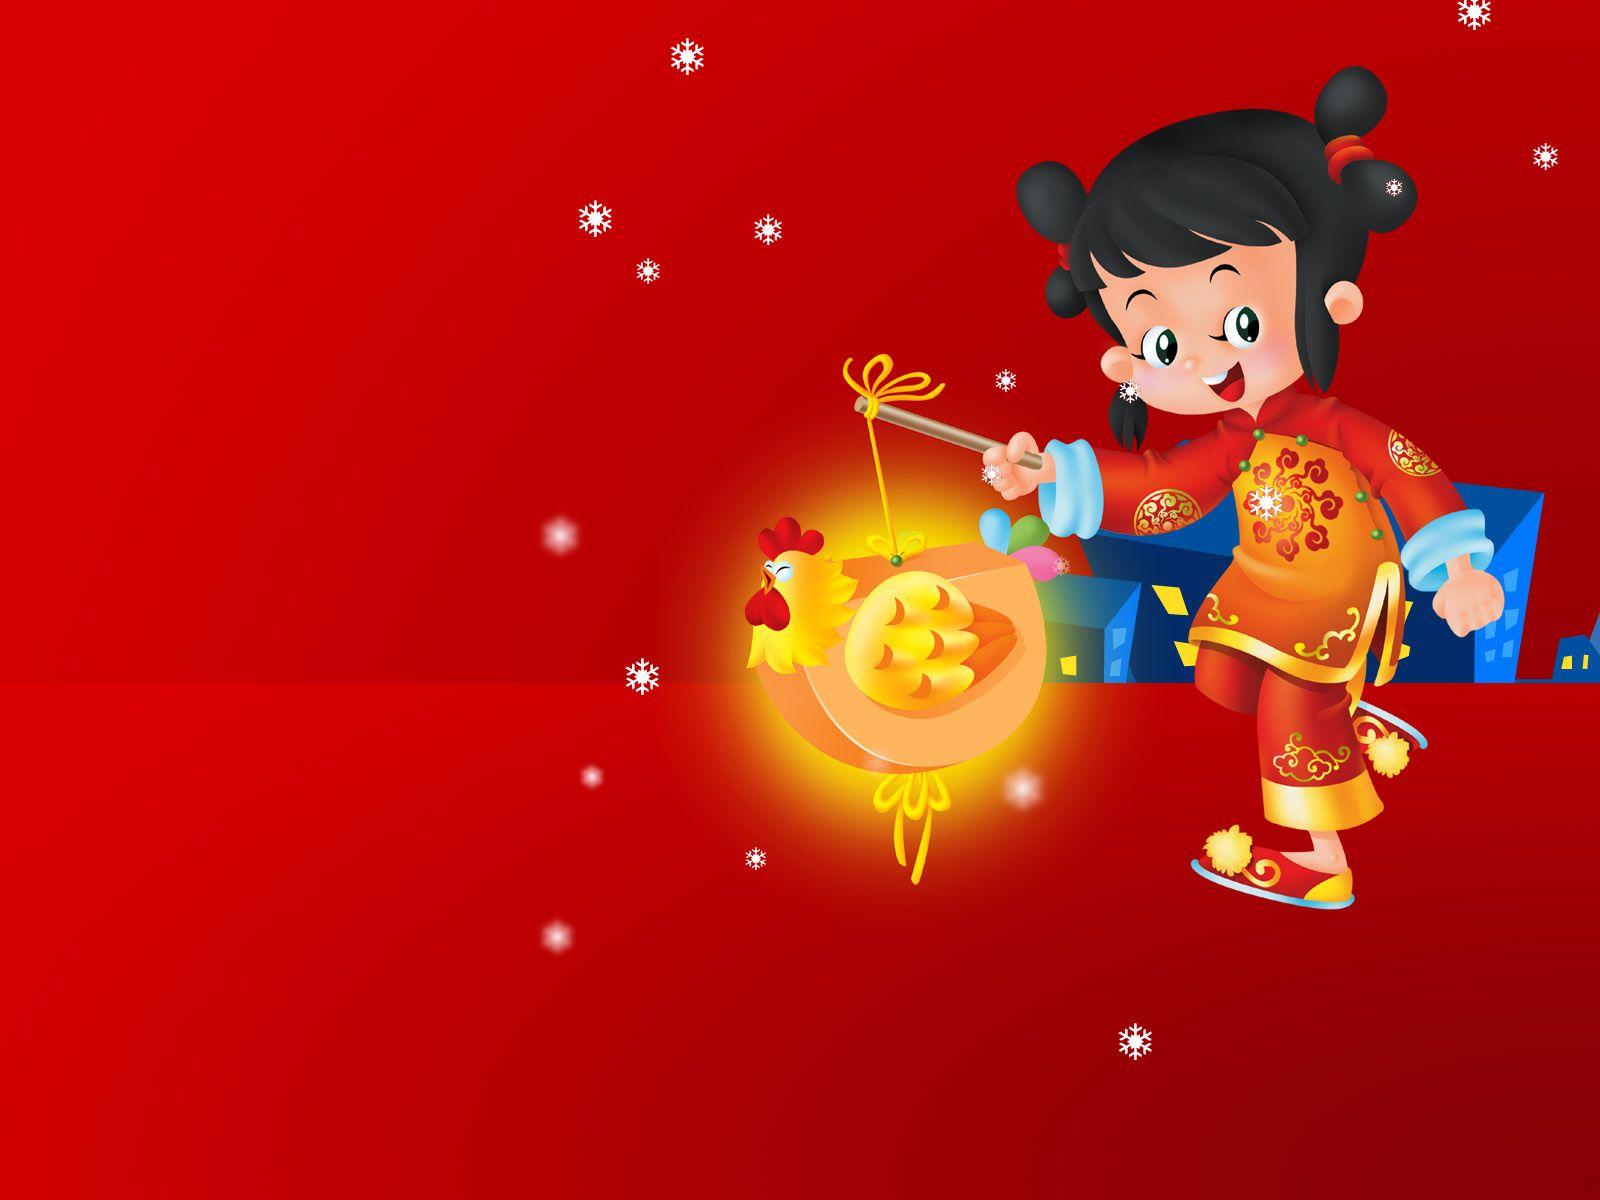 chinese new year wallpaper desktop wallpapers 2017 - grasscloth